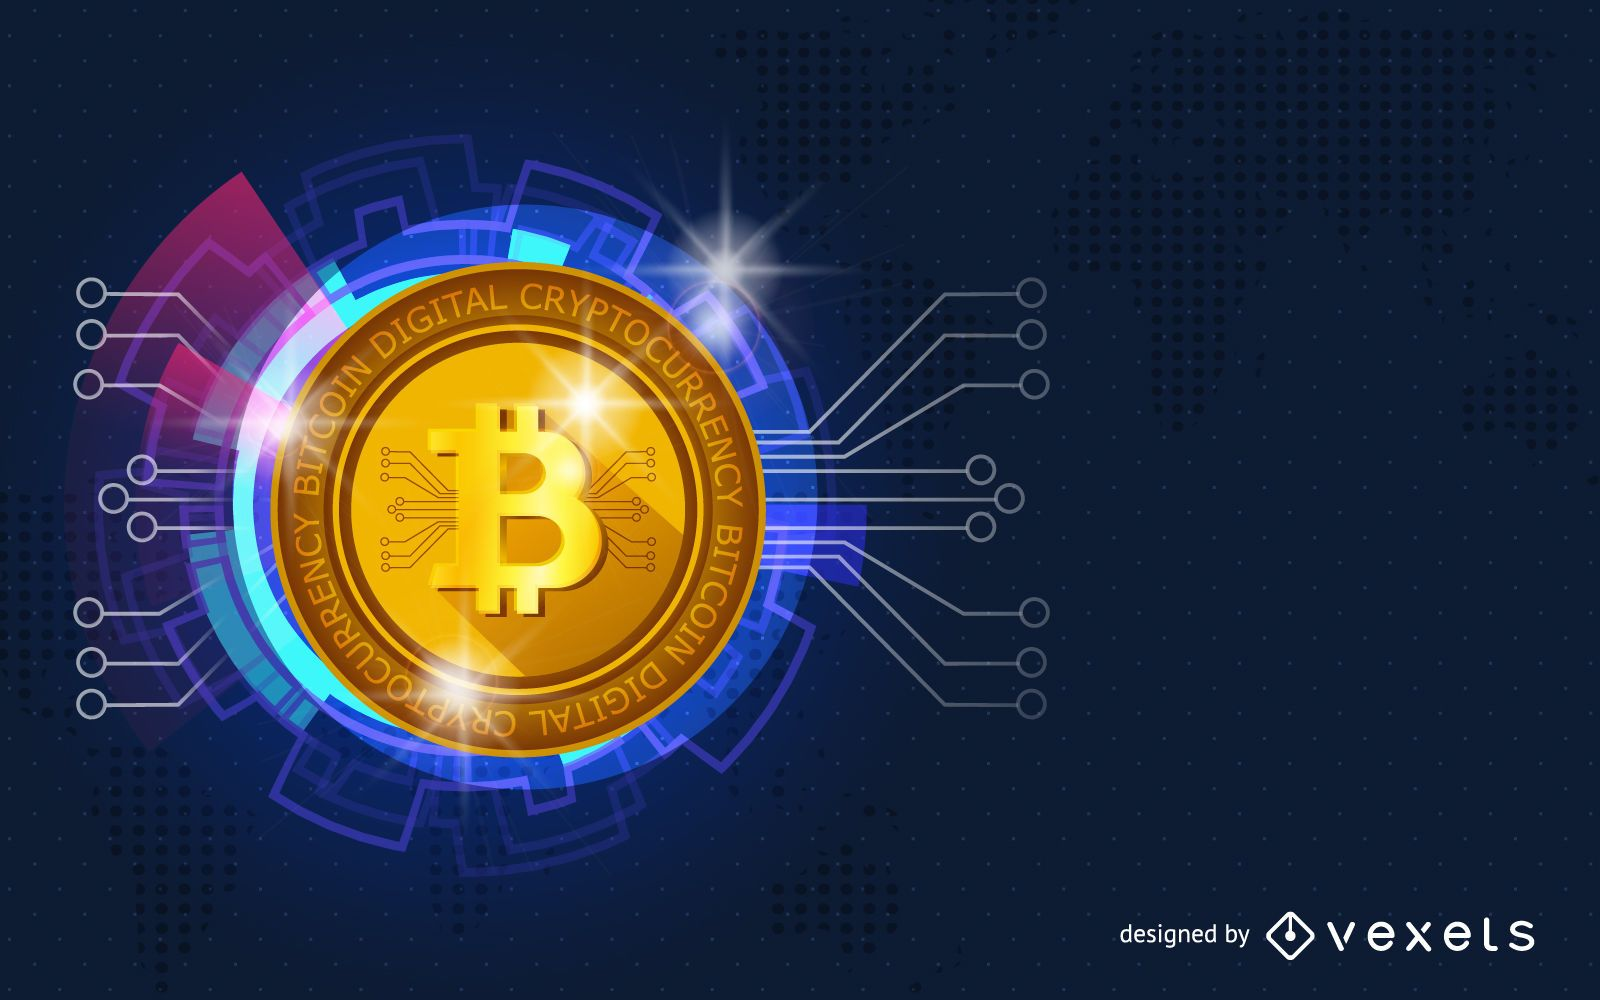 Bitcoin cryptocurrency header design